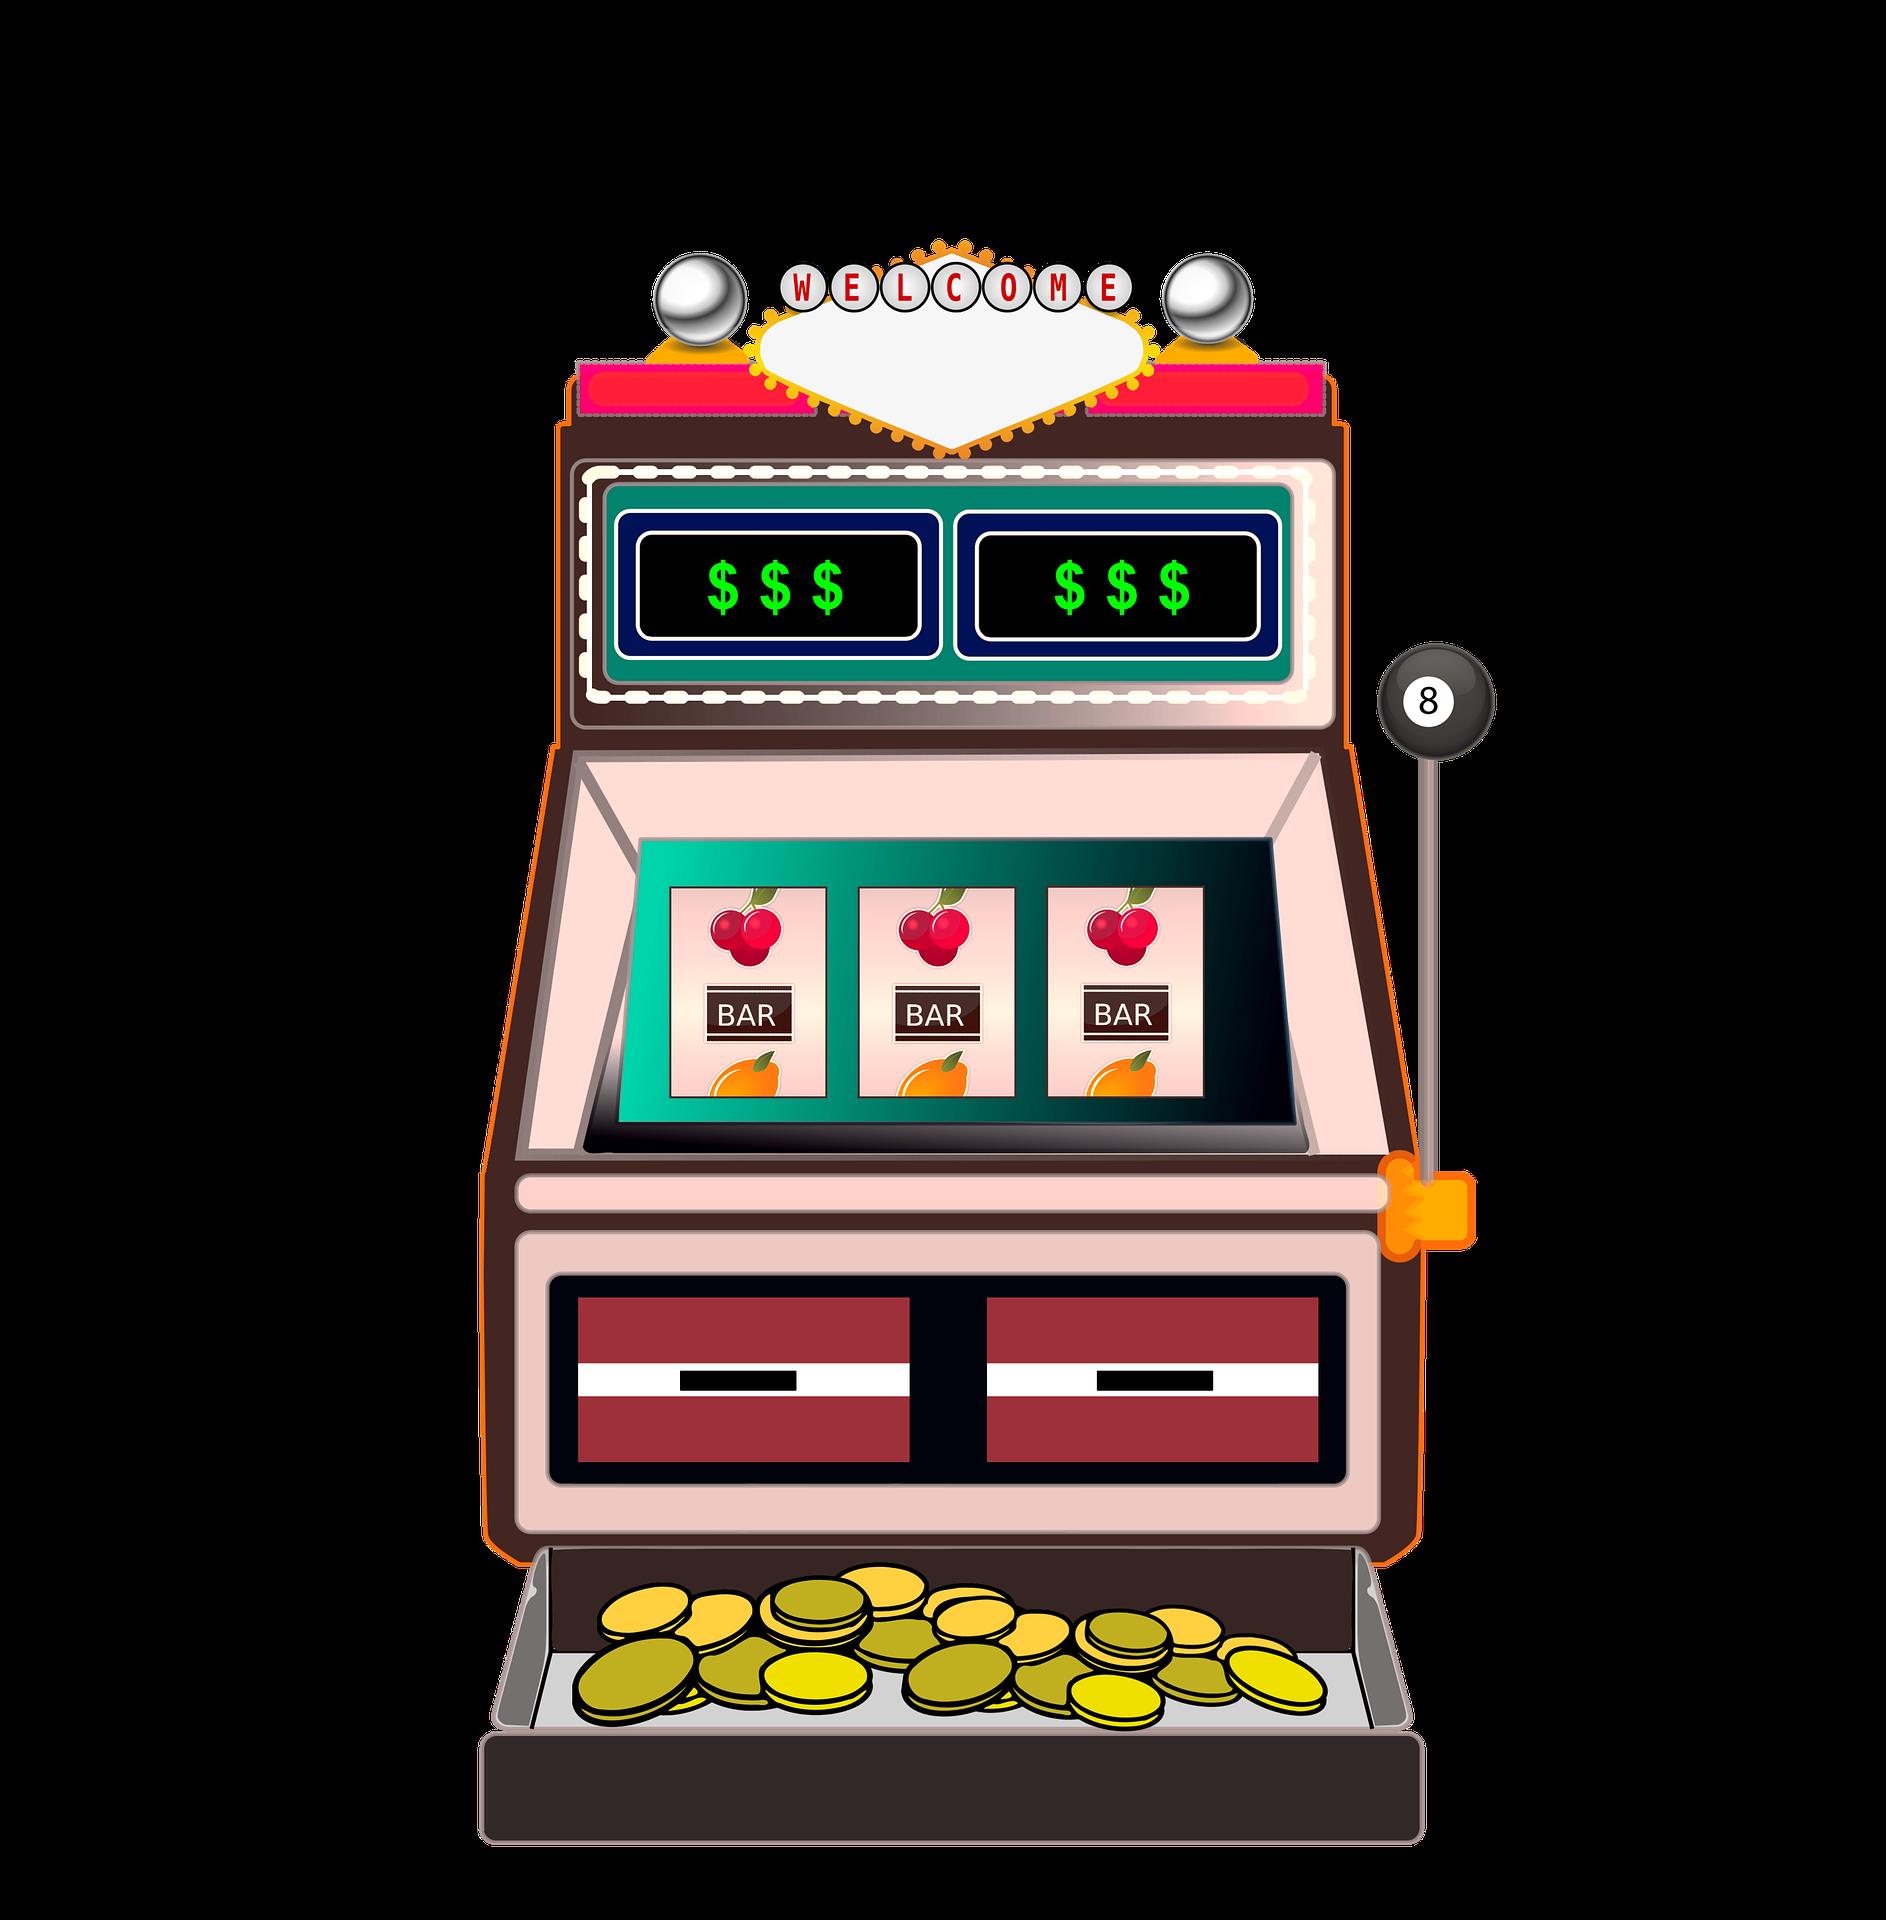 Slot machine symbols png